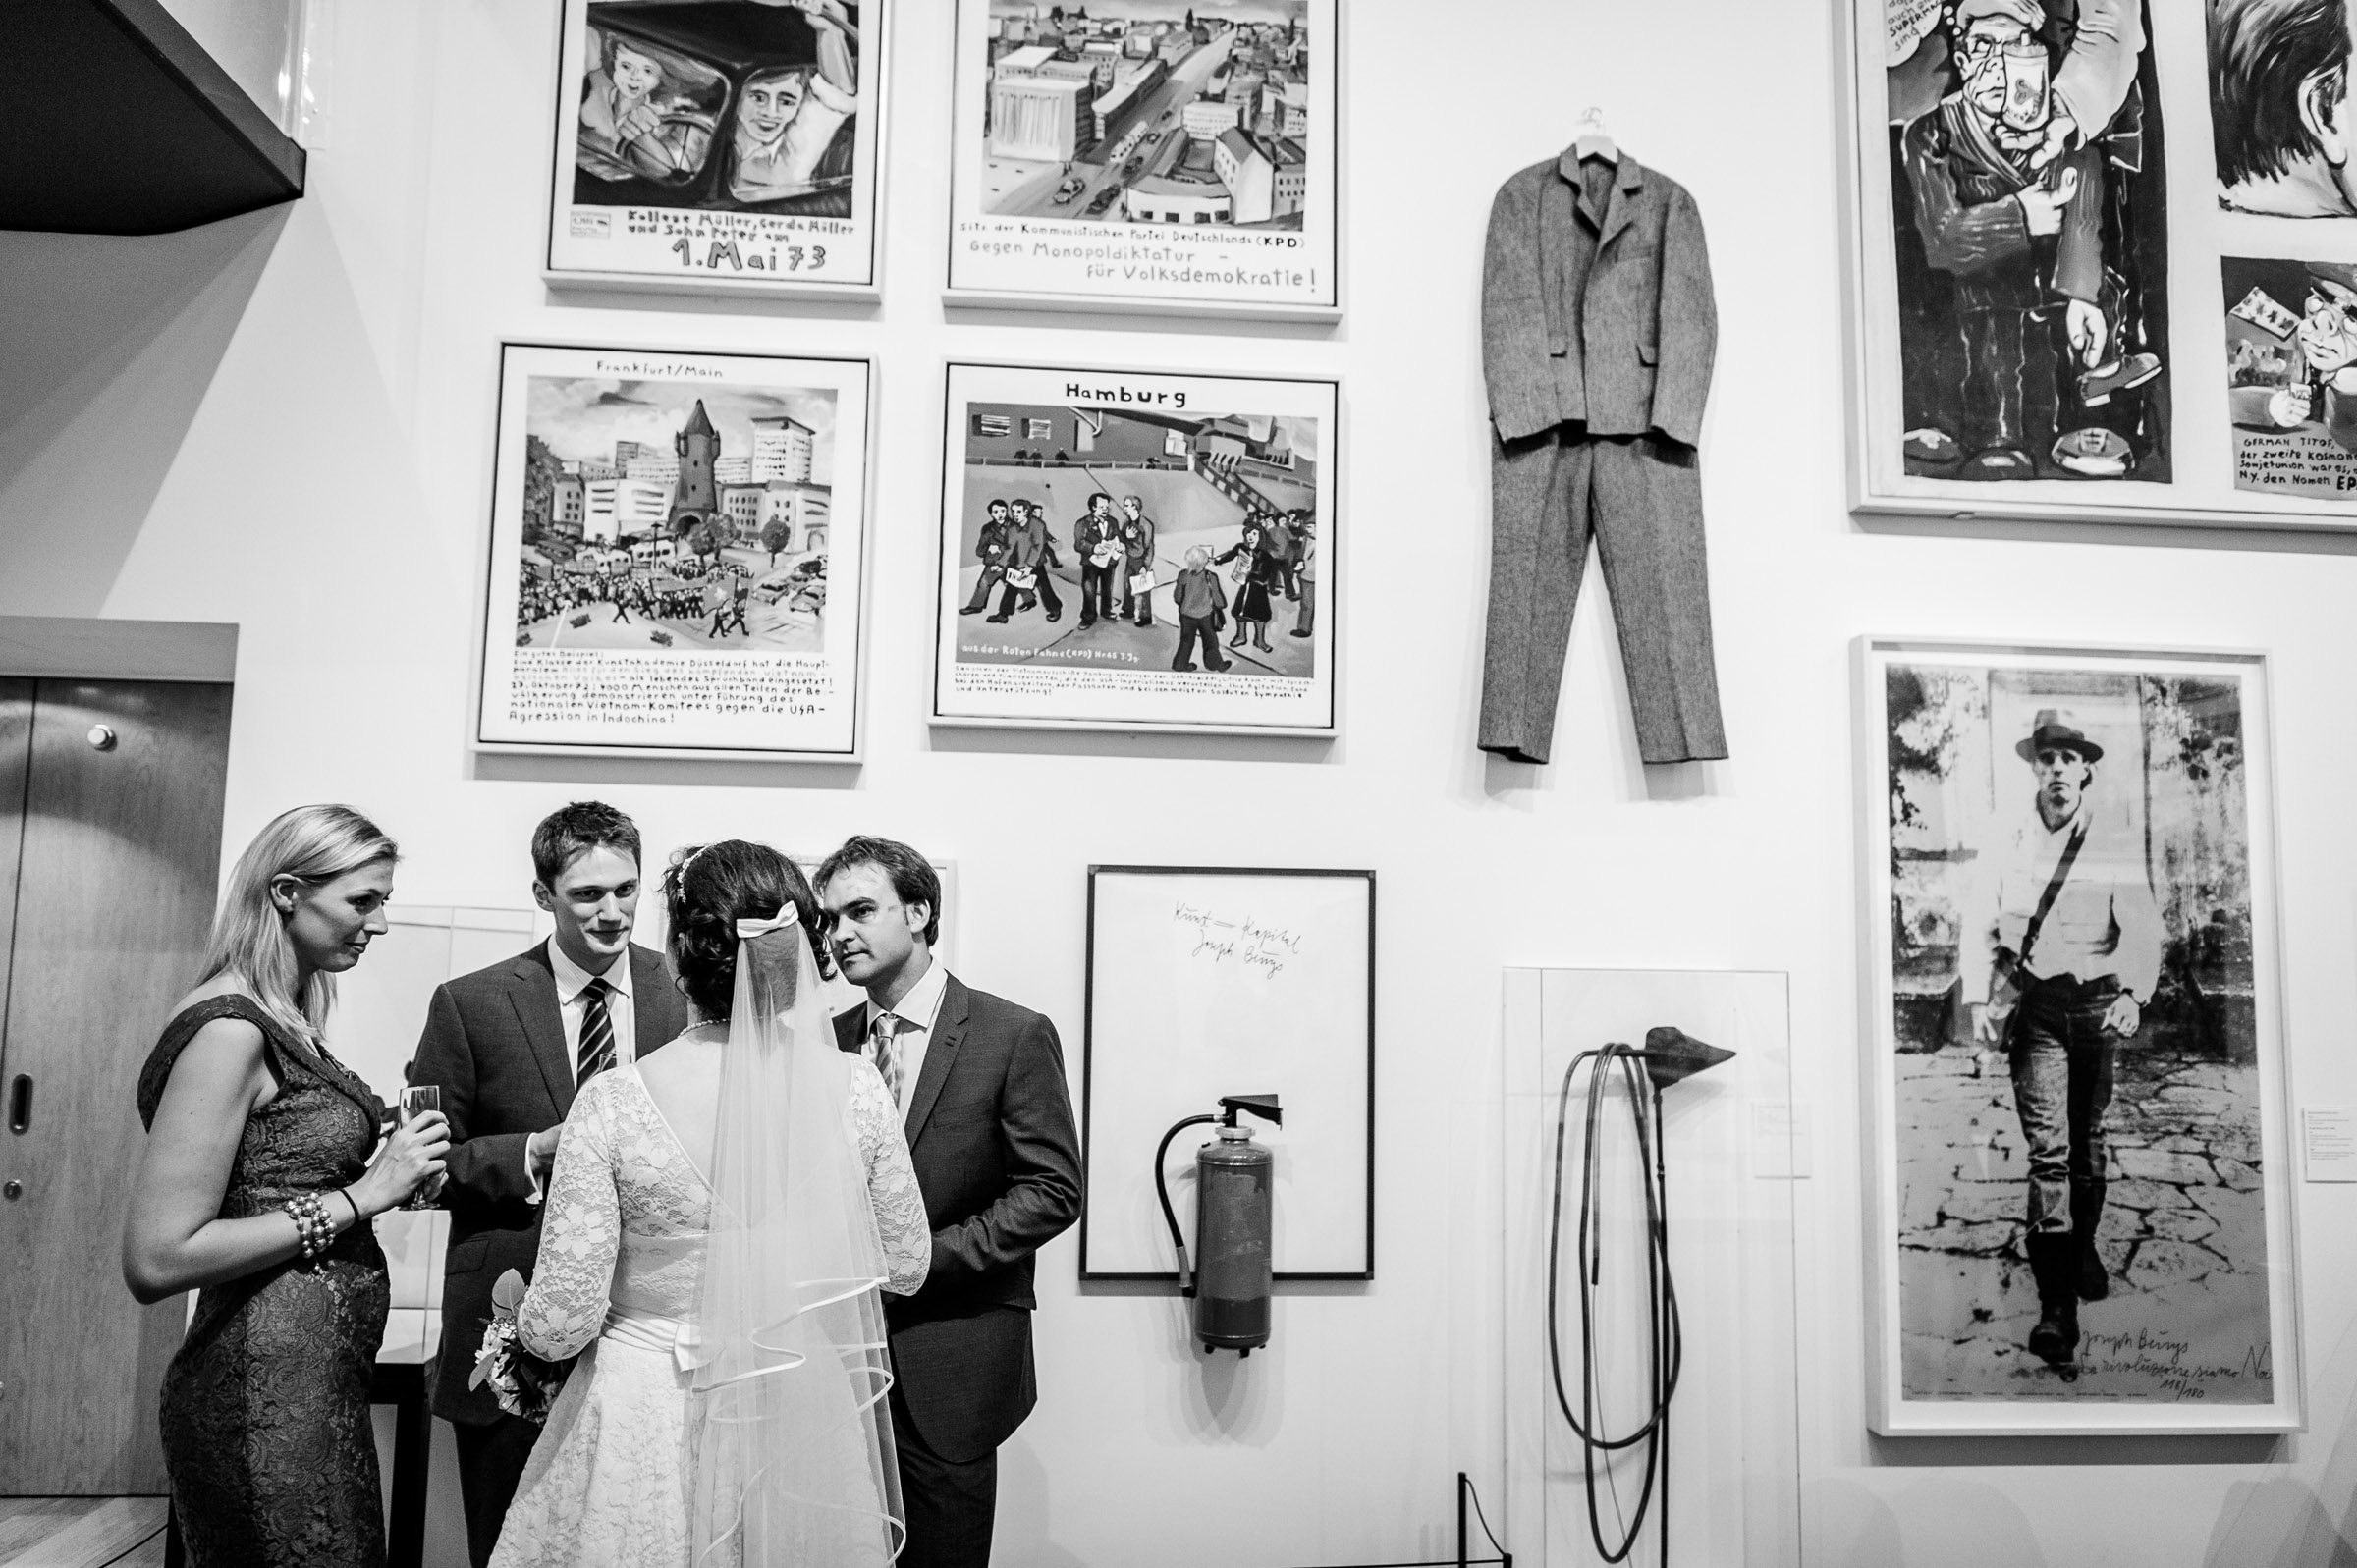 Ashmolean-Museum-Wedding-Pictures-0036.jpg